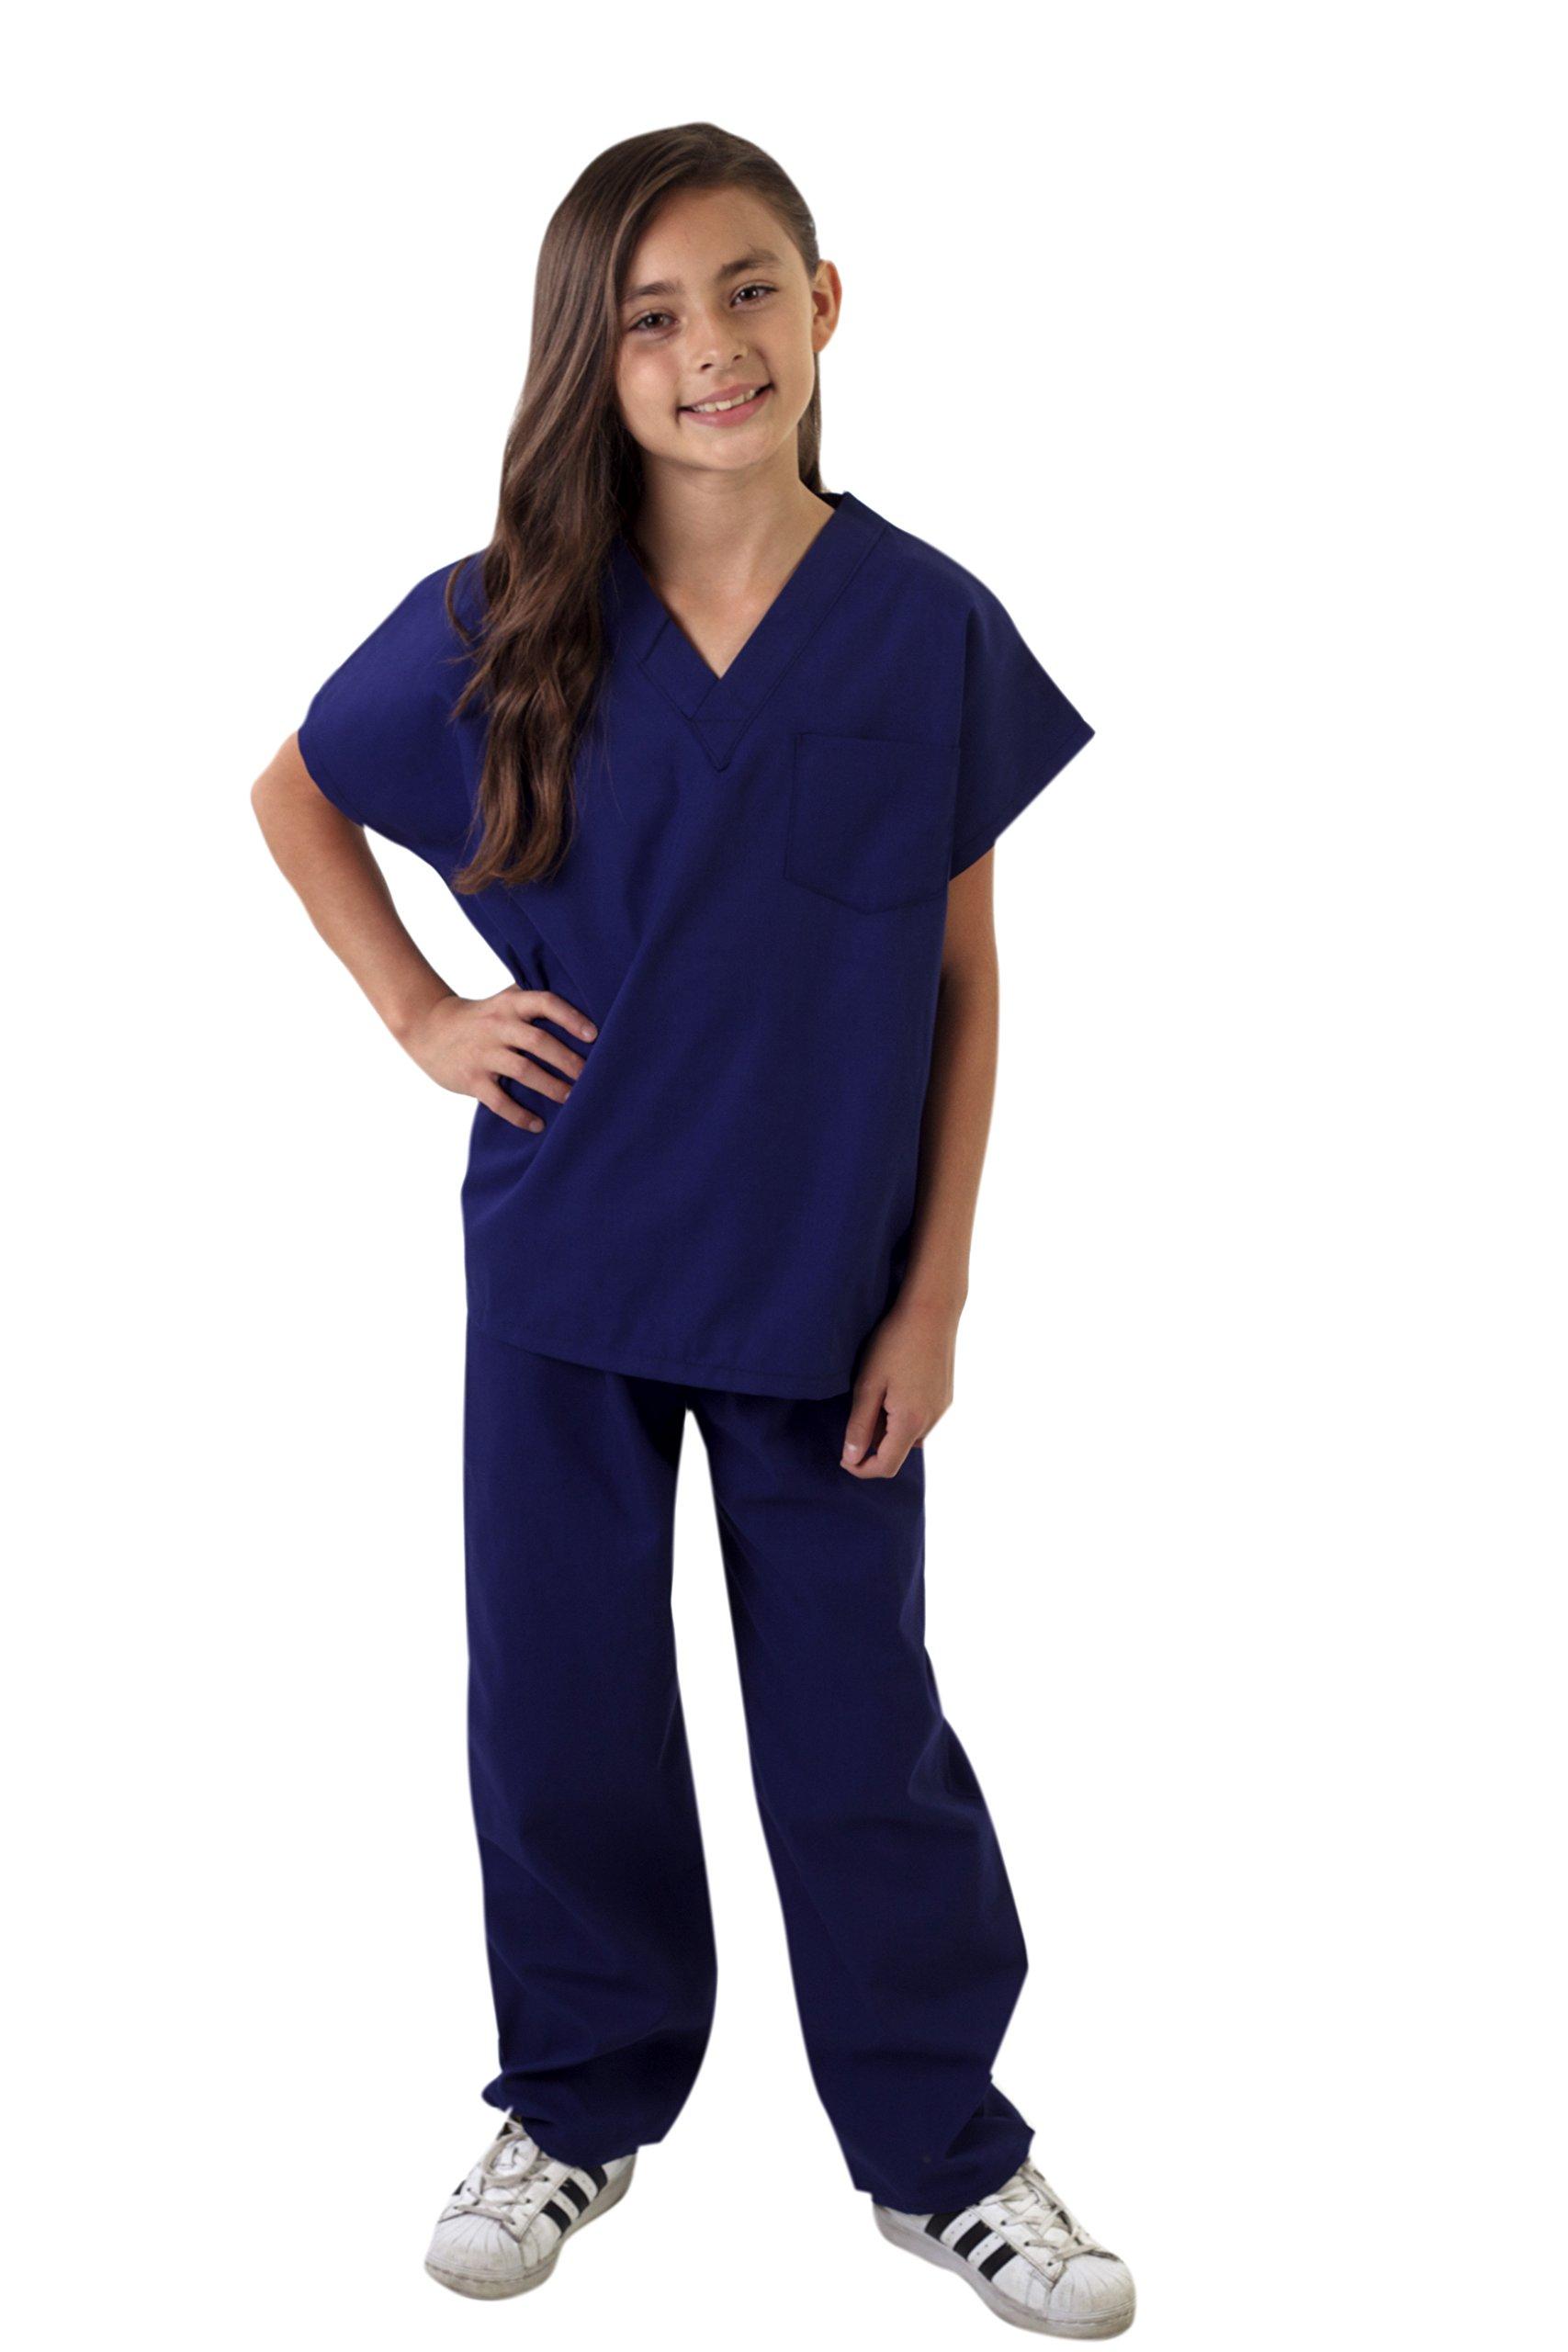 931e542ba6b Cheap Dental Scrub Uniforms, find Dental Scrub Uniforms deals on ...